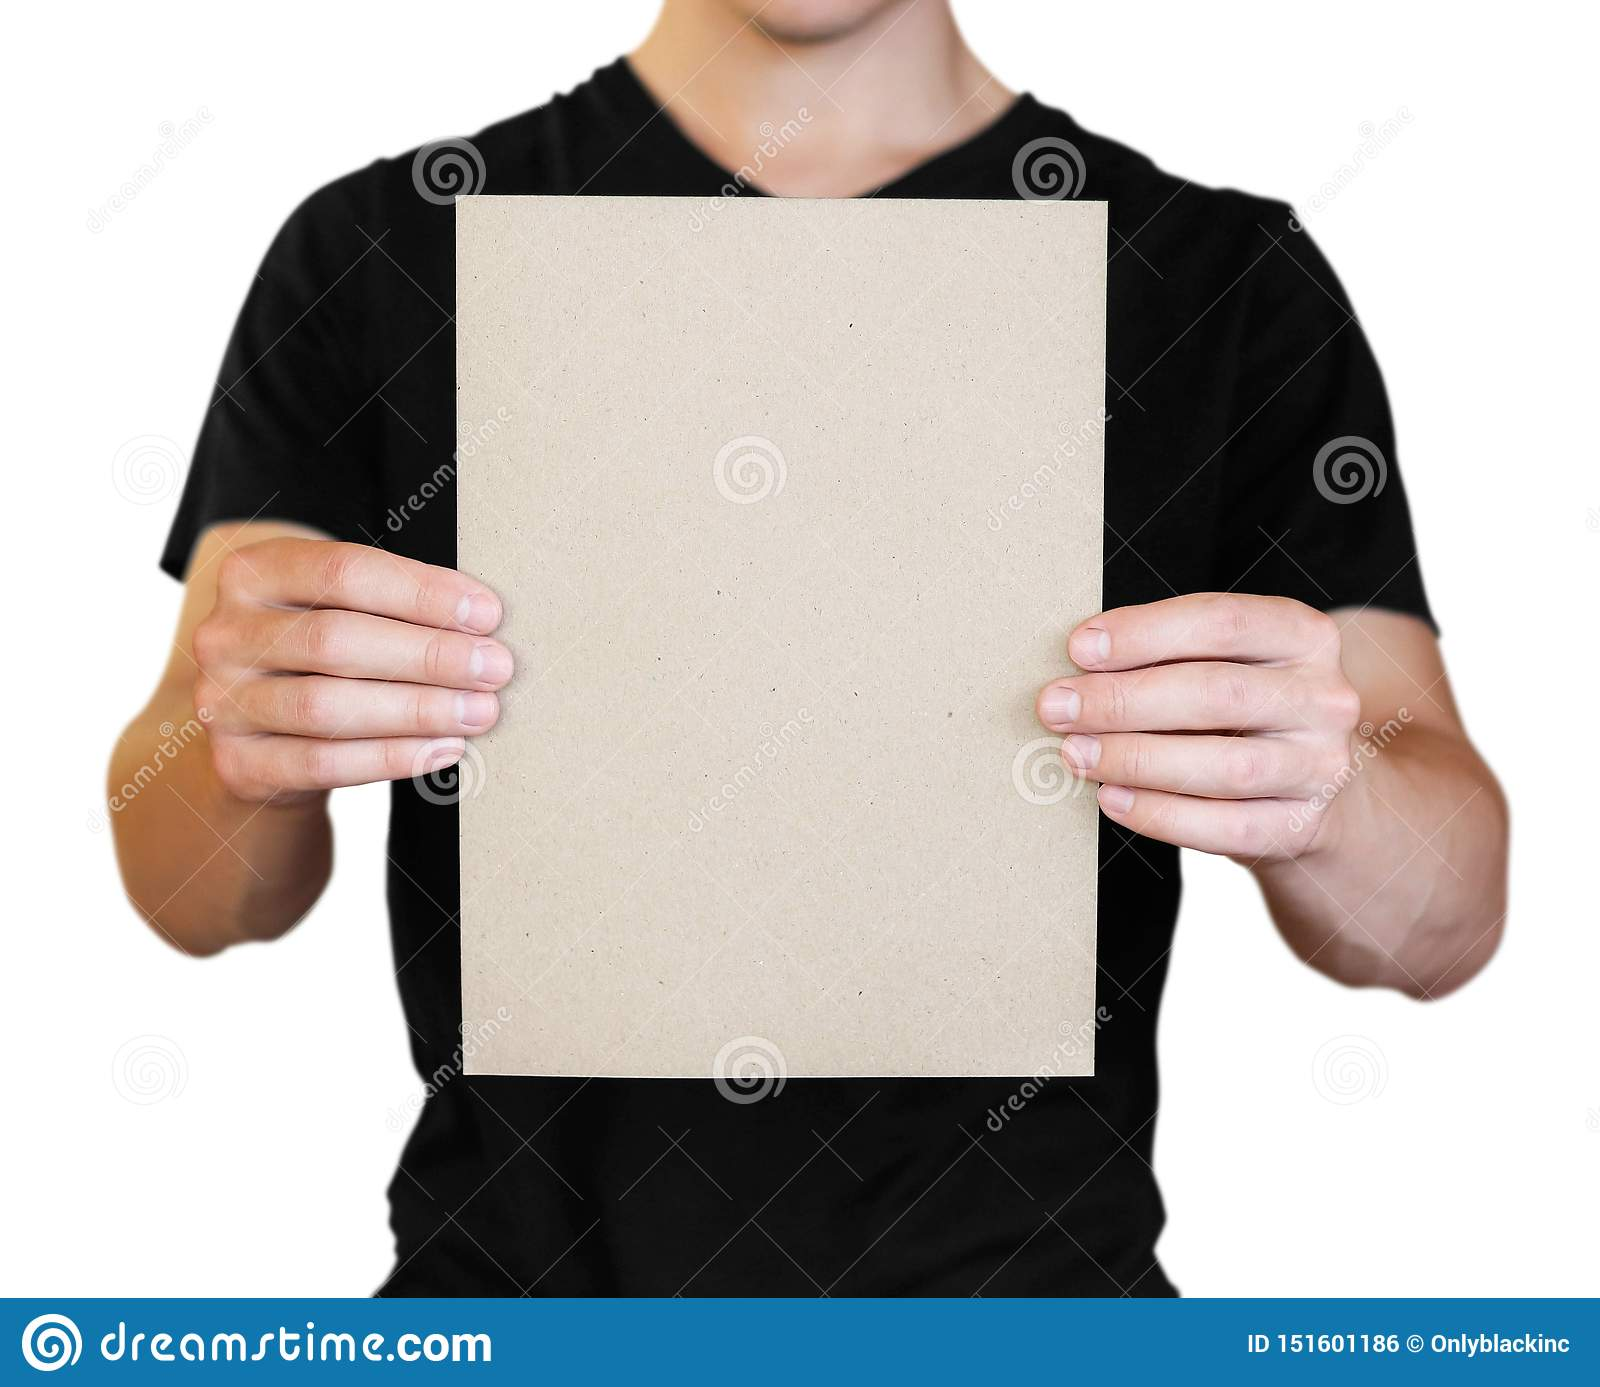 X39 Plain sheet white paper